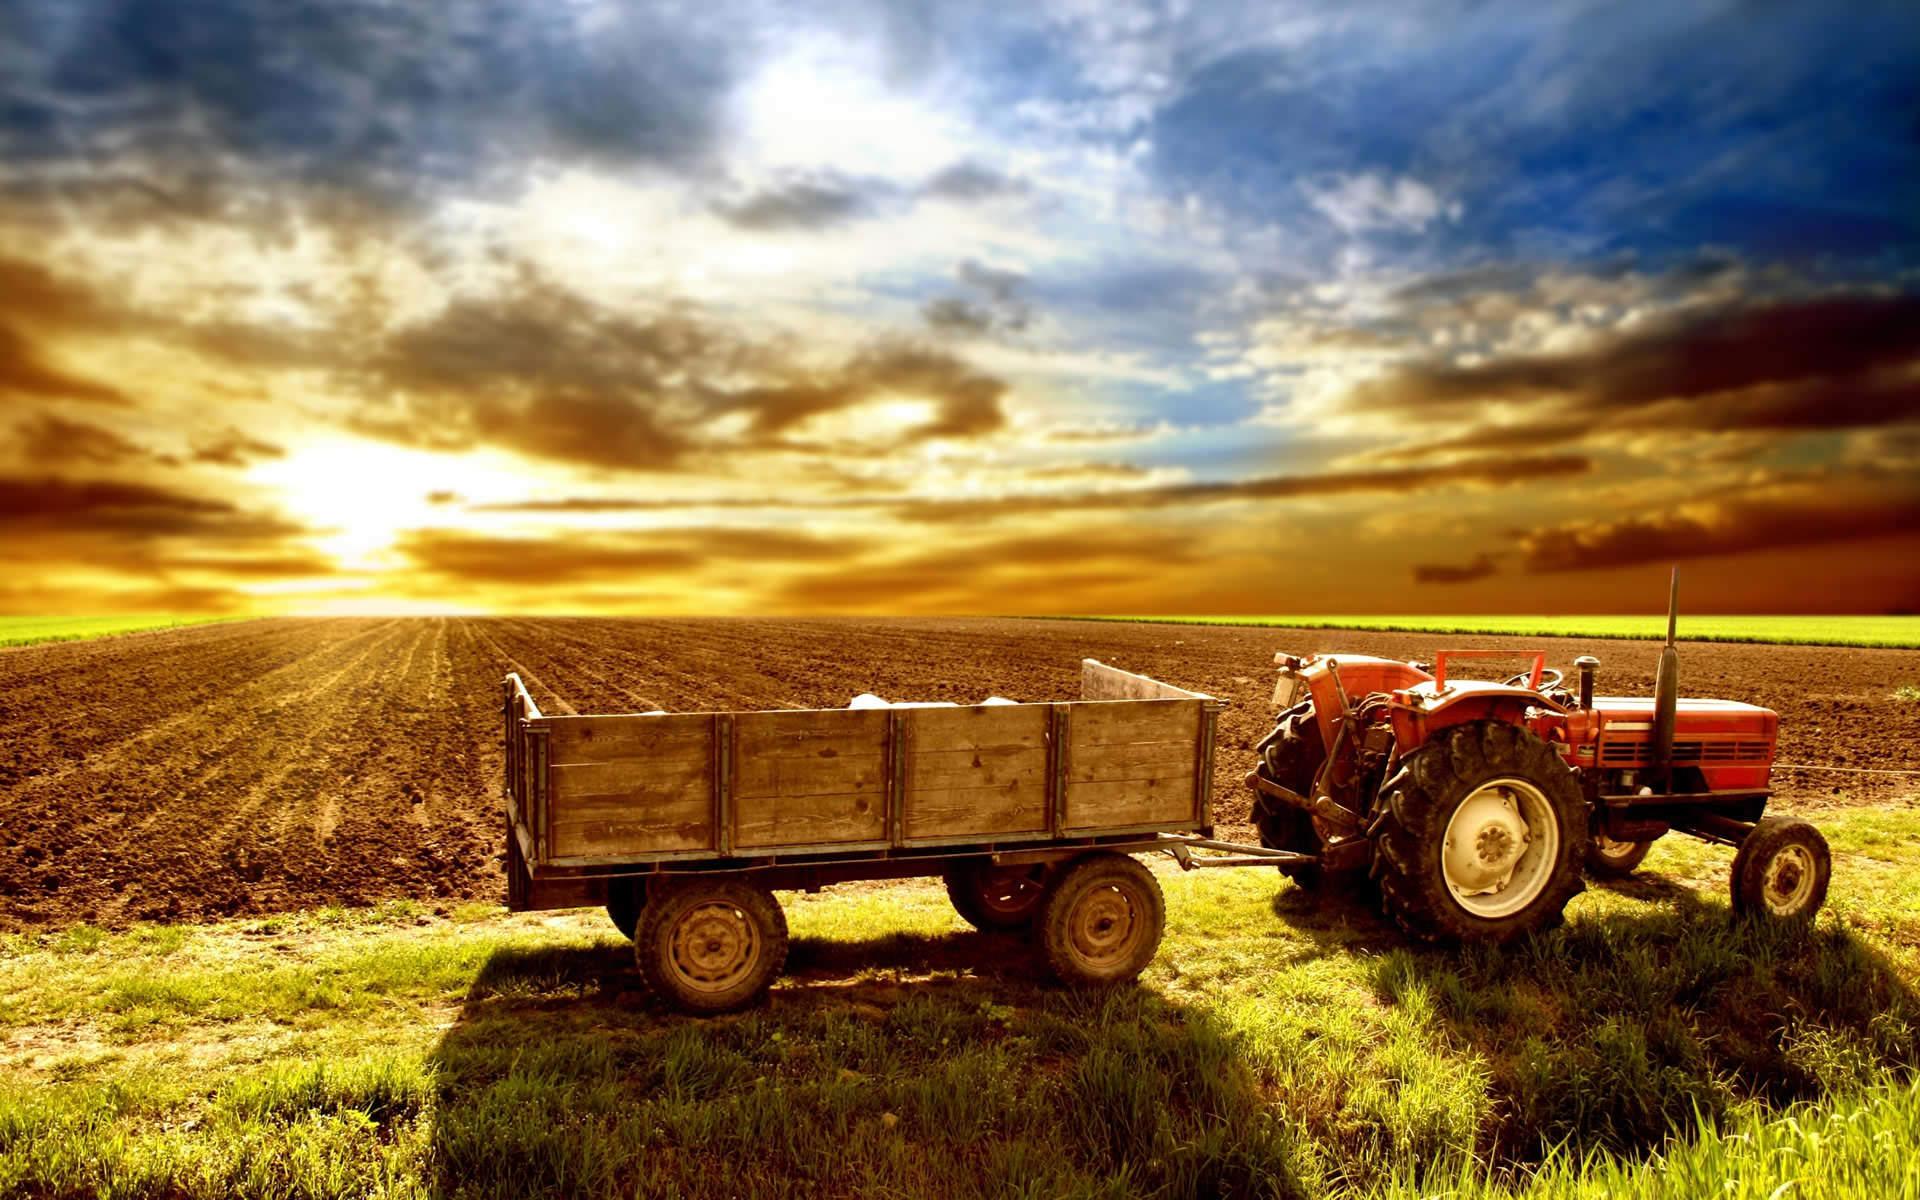 50] Farming Wallpapers on WallpaperSafari 1920x1200